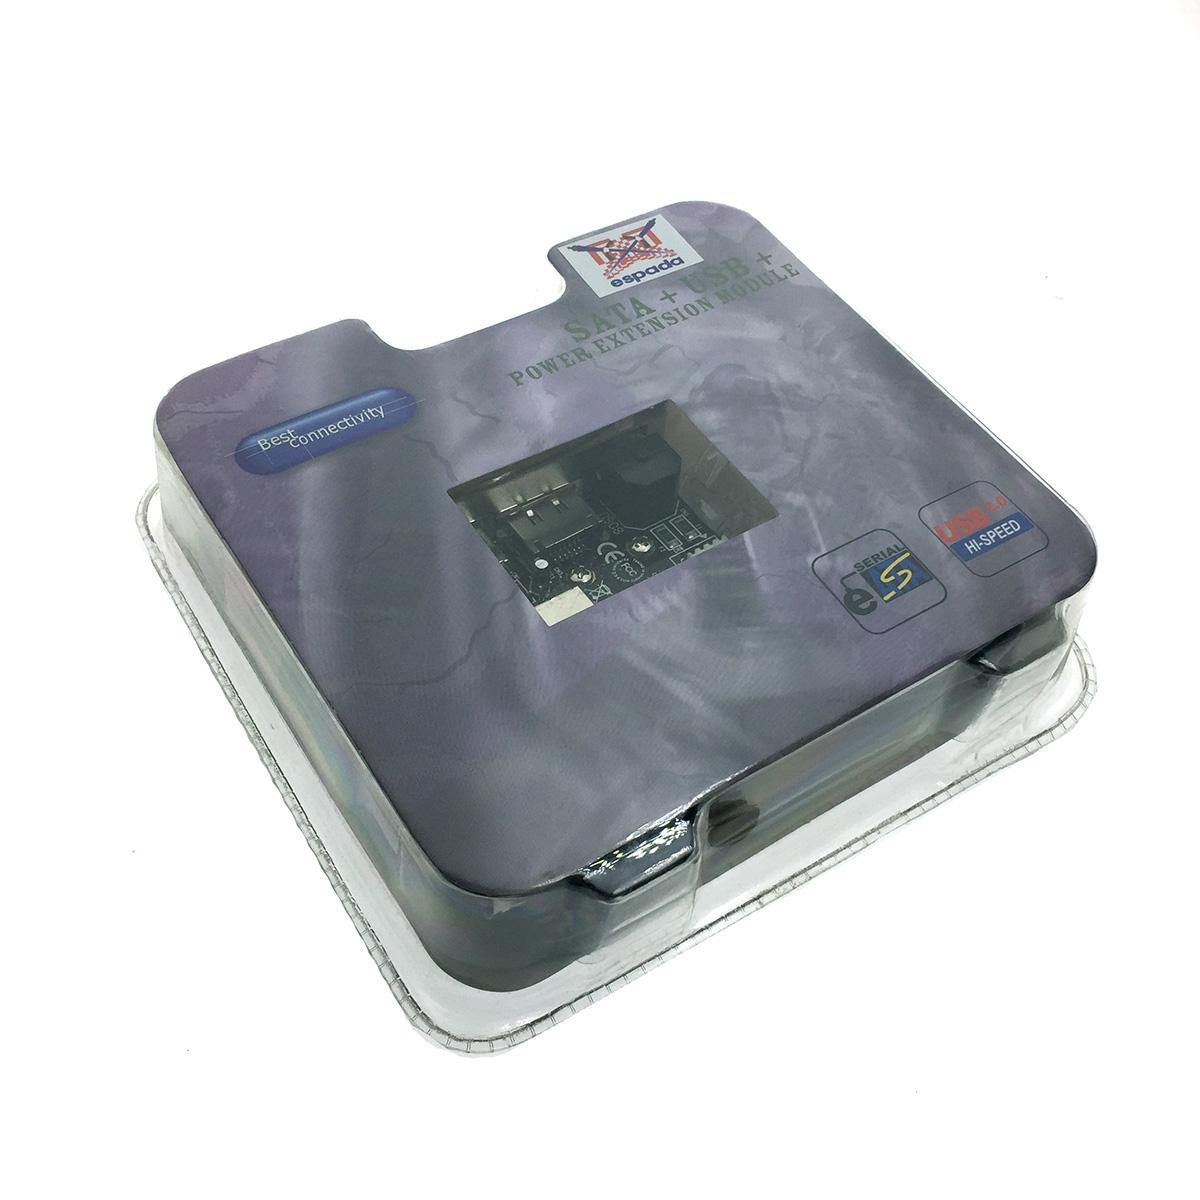 Контроллер SATA + USB + Power Extension module SD-SUREM1-B2 Espada box